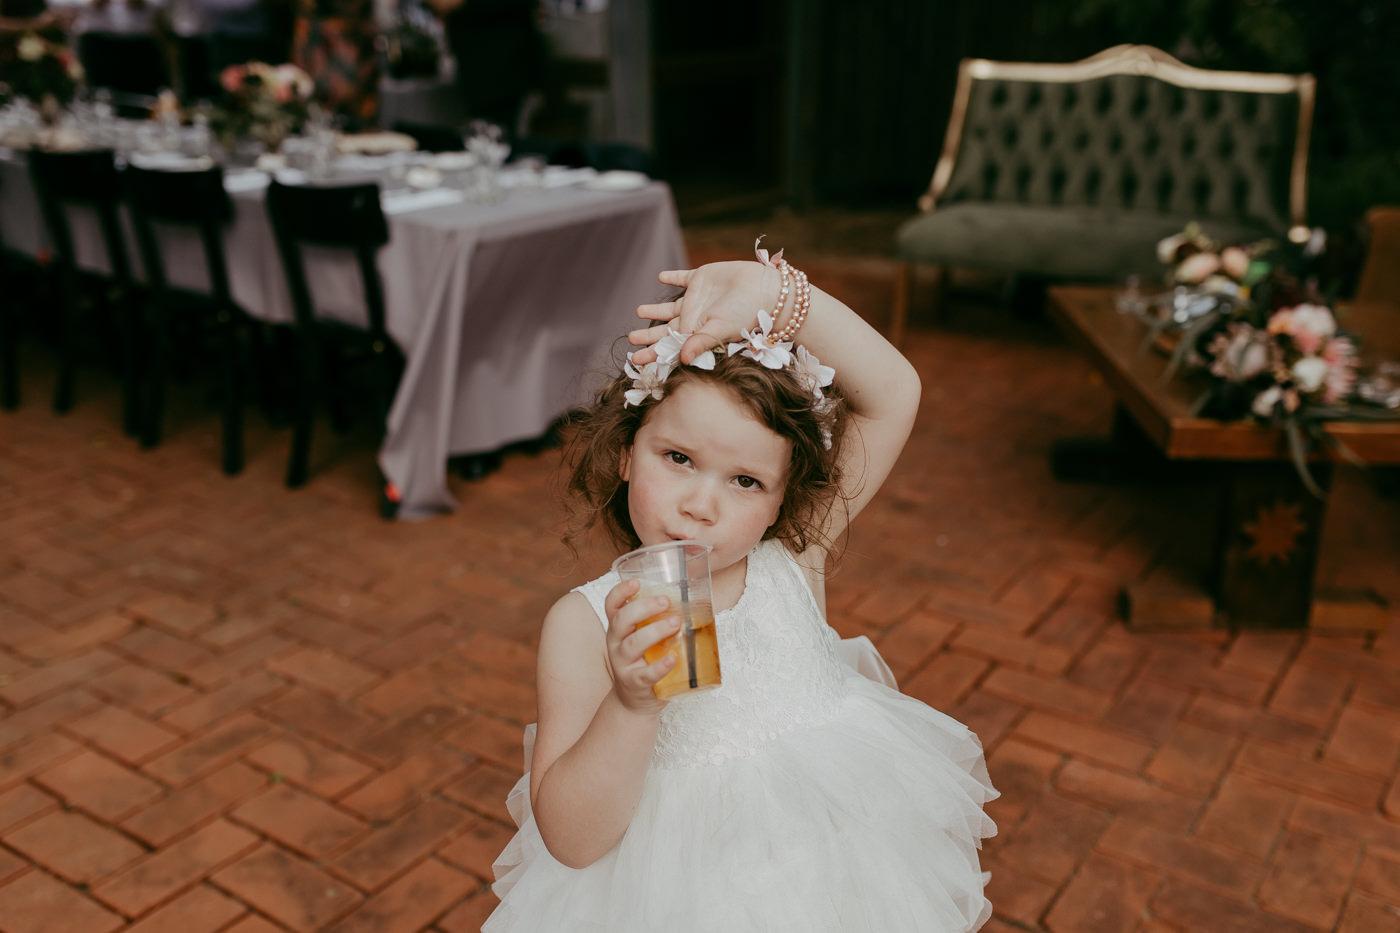 Anthony & Eliet - Wagga Wagga Wedding - Country NSW - Samantha Heather Photography-118.jpg